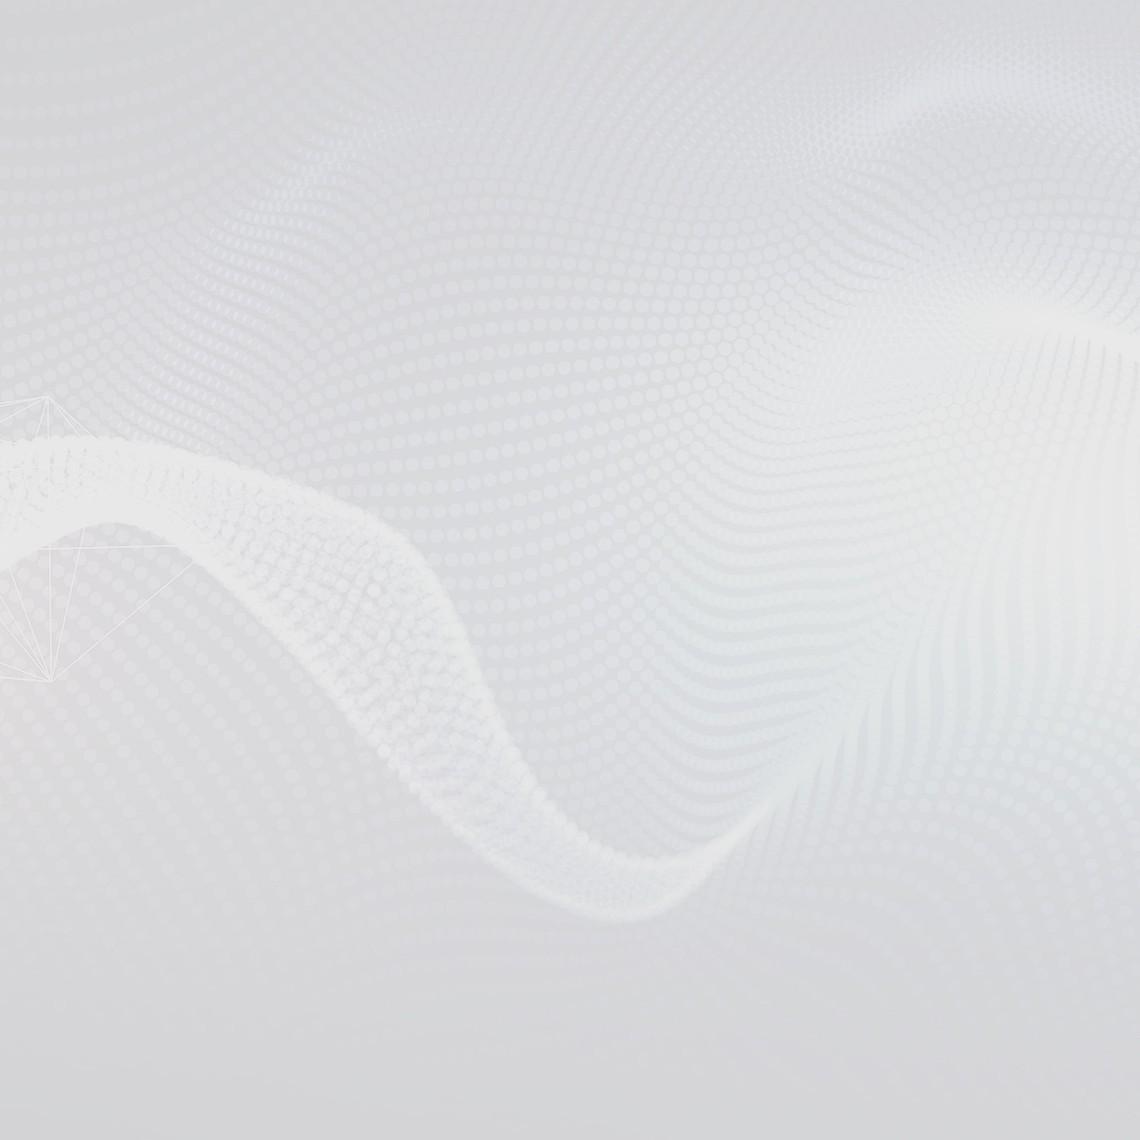 Light grey dotted background - Nano milage